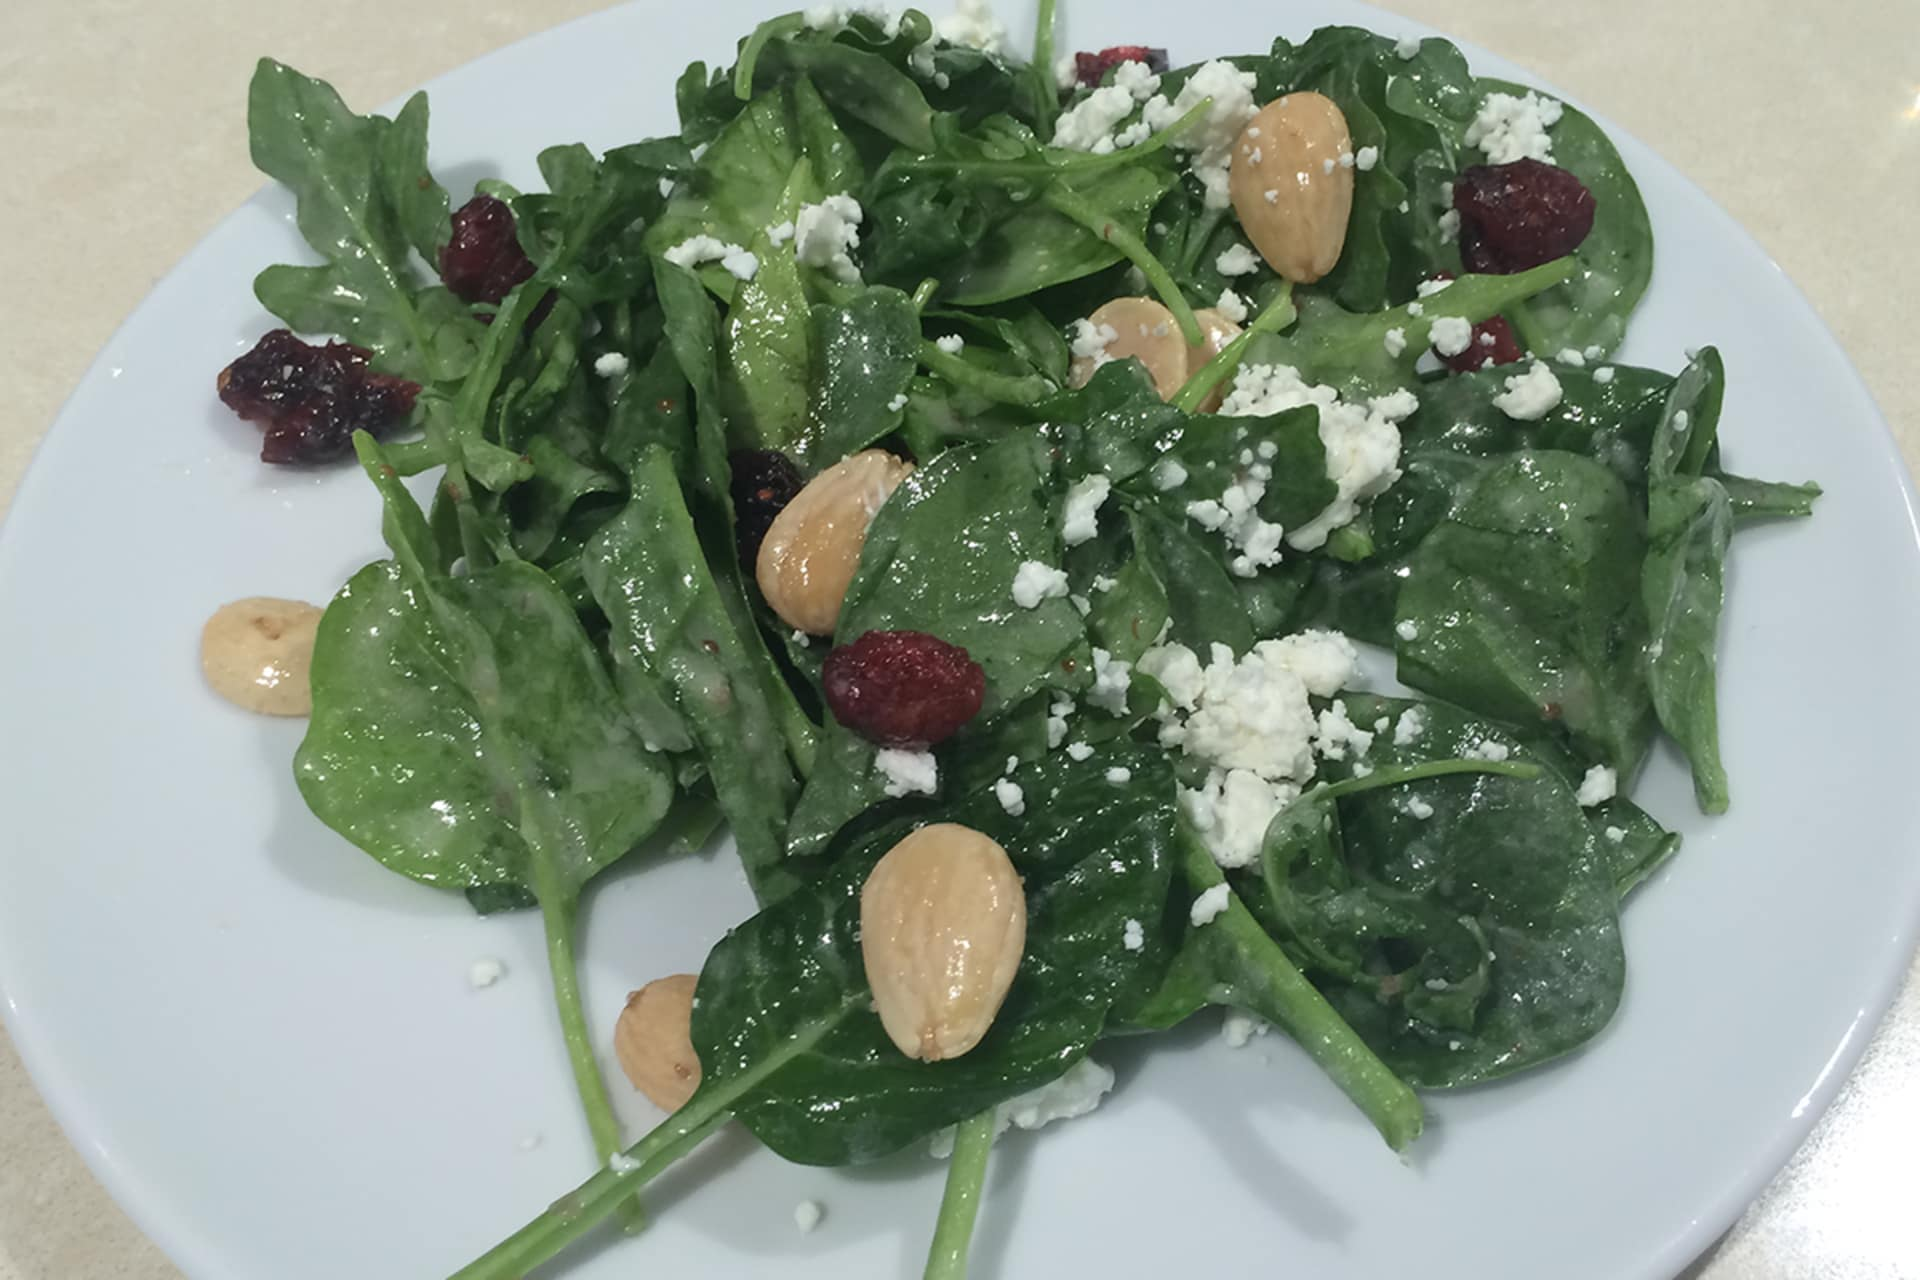 Spinach & Arugula